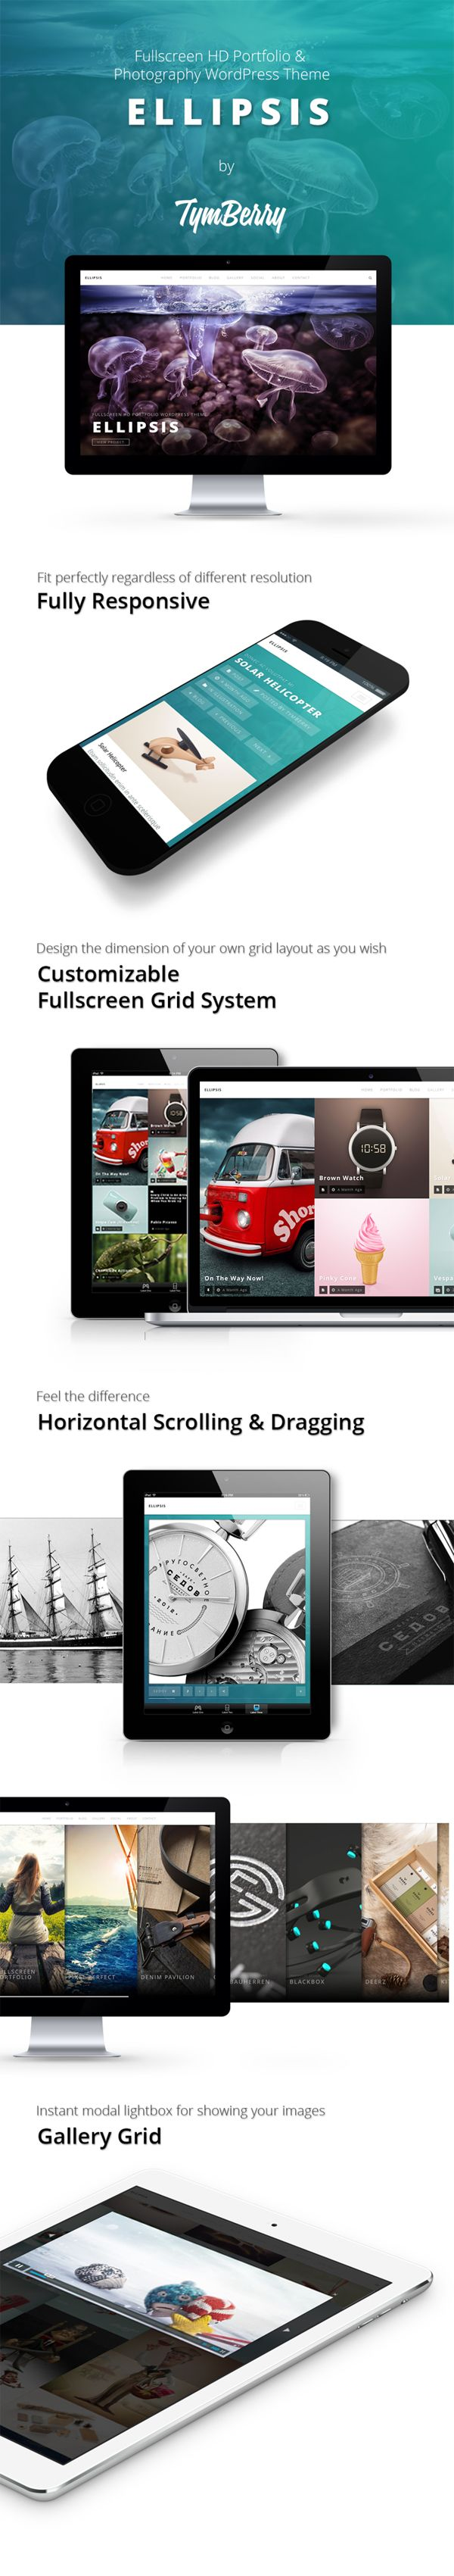 Incredible web design with really nice colour scheme!